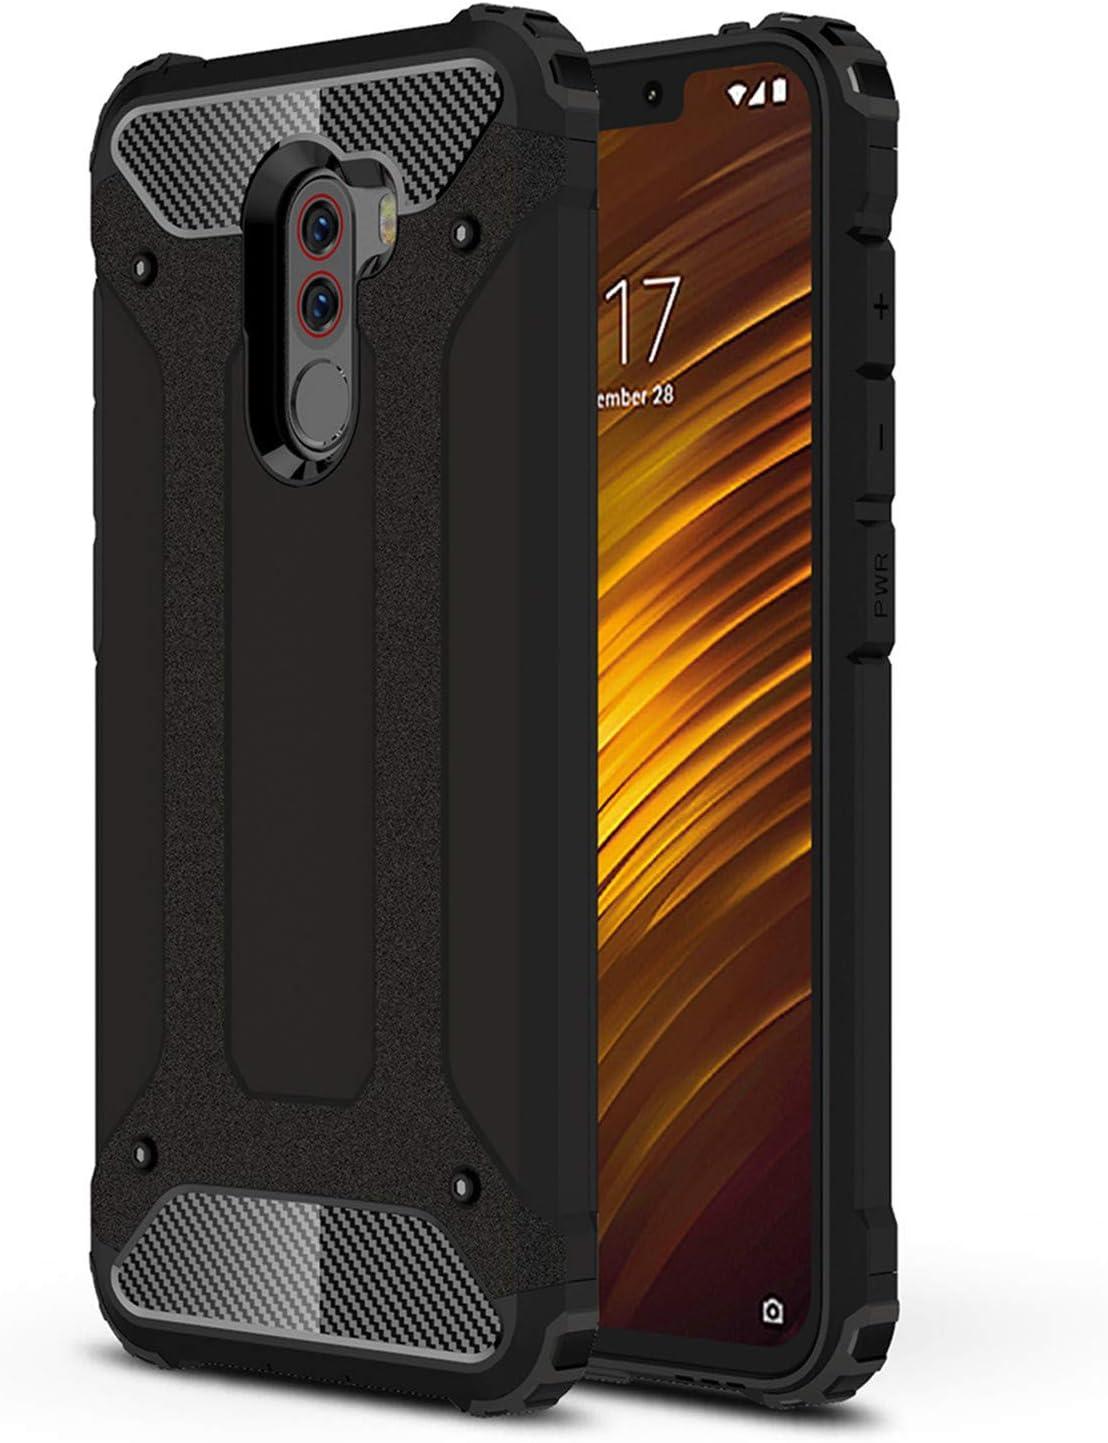 LXHGrowH Funda Xiaomi Pocophone F1, Fundas 2in1 Dual Layer Anti-Shock 360° Full Body Protección TPU Silicona Gel Bumper y Duro PC Armadura Carcasa para Xiaomi Pocophone F1, Negro